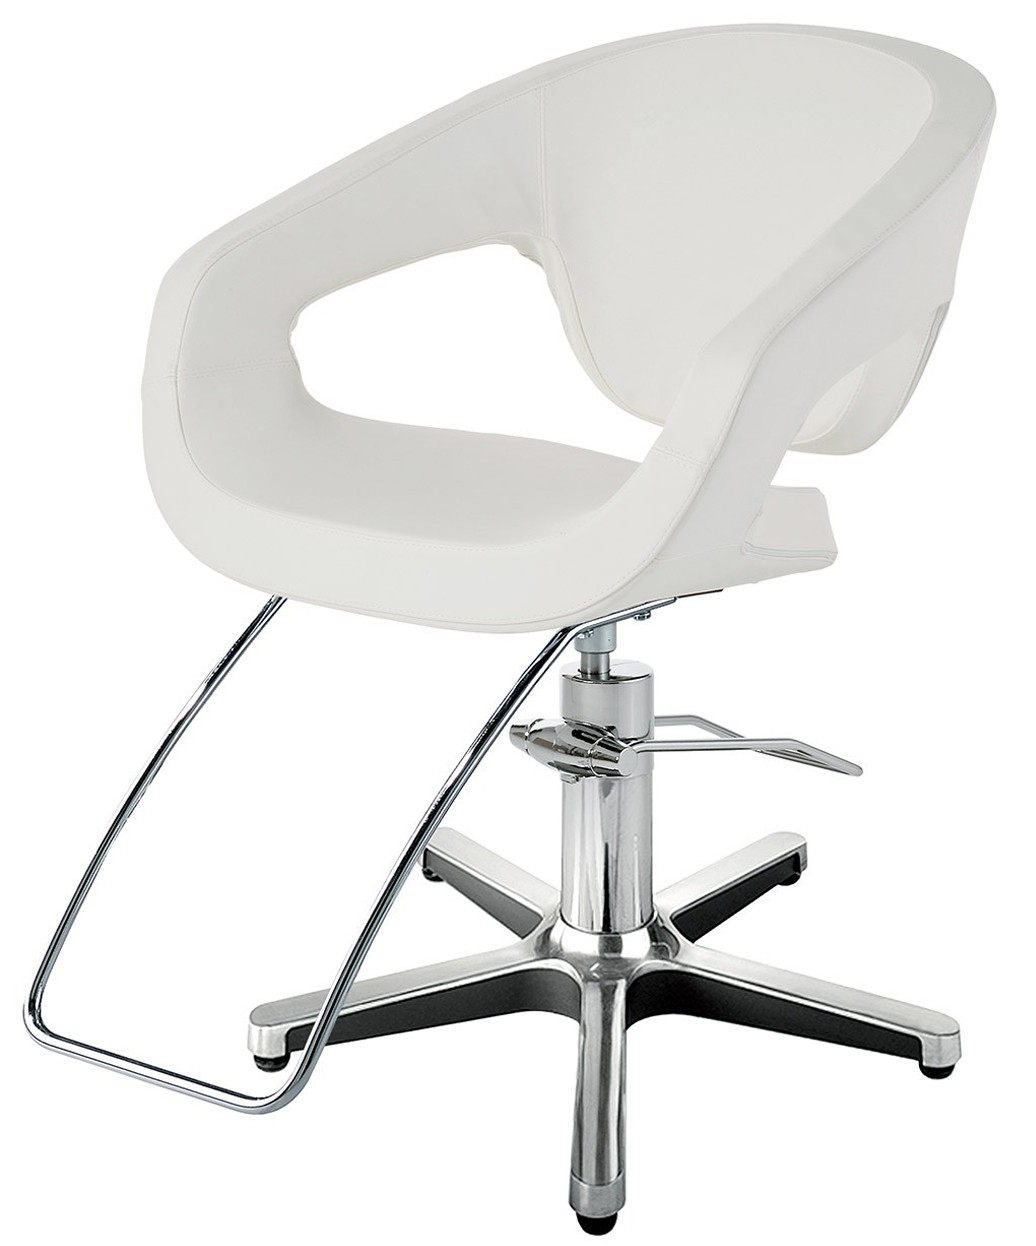 Takara Belmont ST-M30 Strip Tease Styling Chair